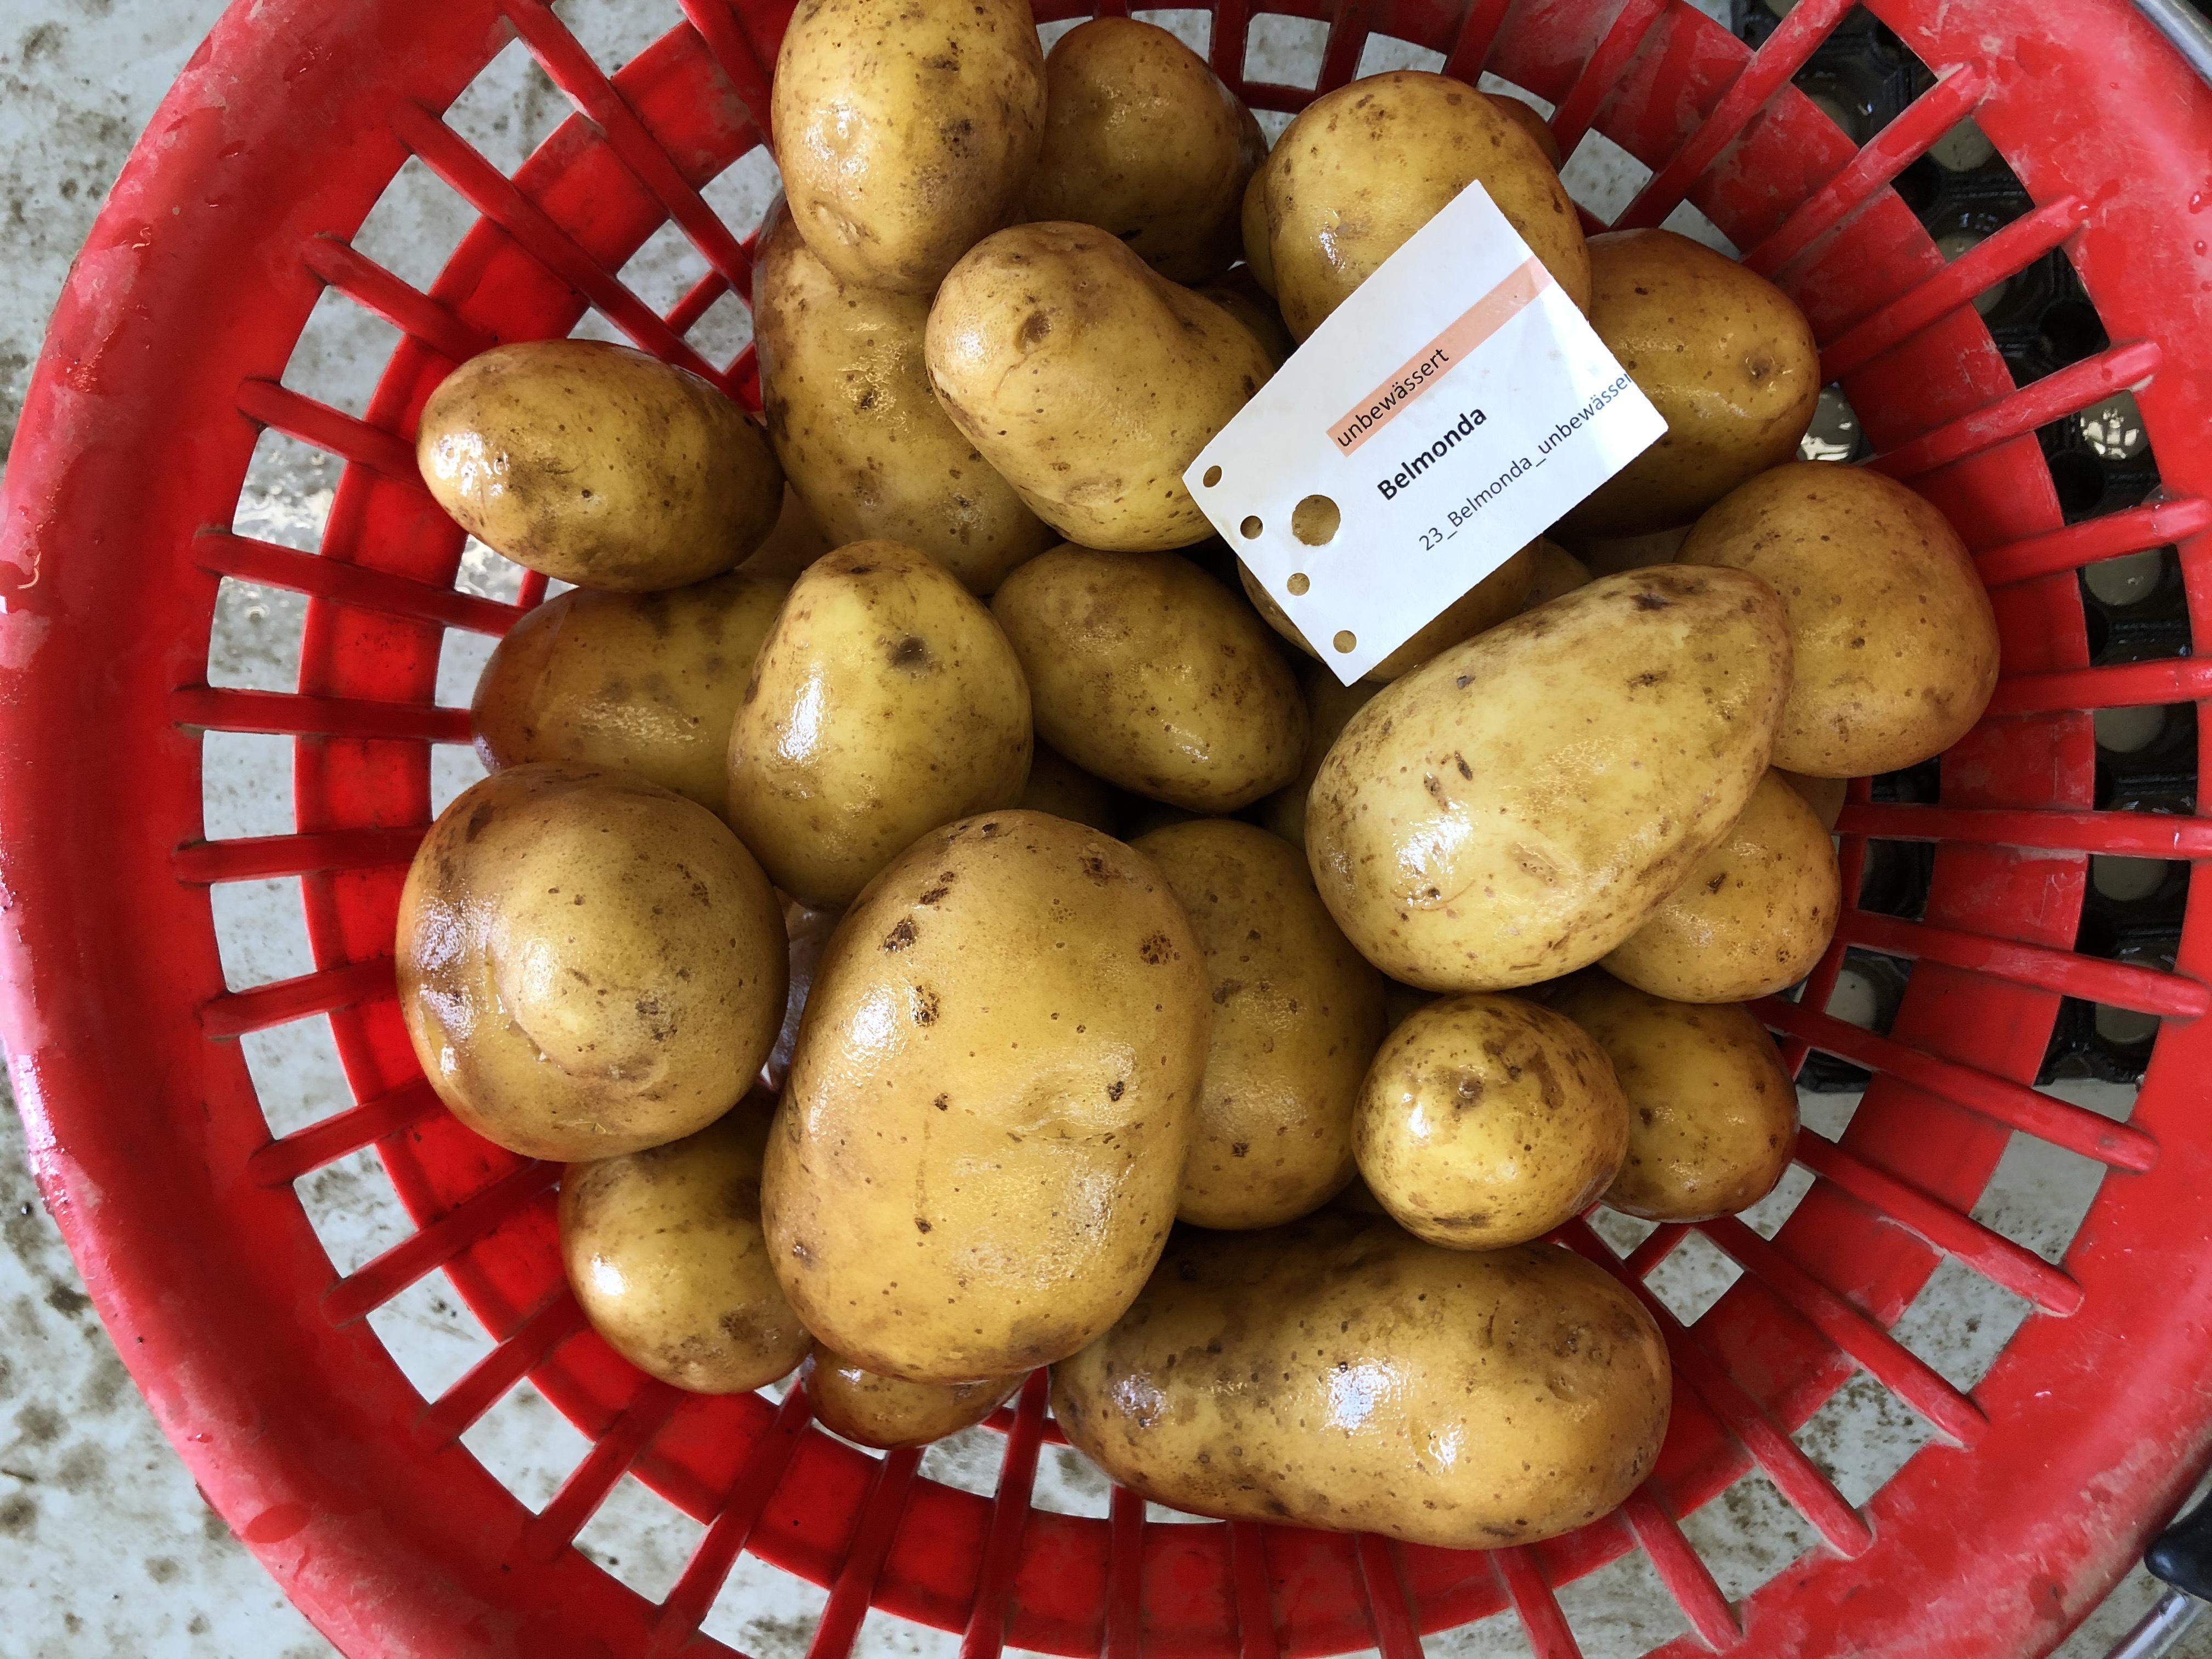 Waschprobe Sorte Belmonda, Sortenversuch Kartoffeln, Humlikon 2020